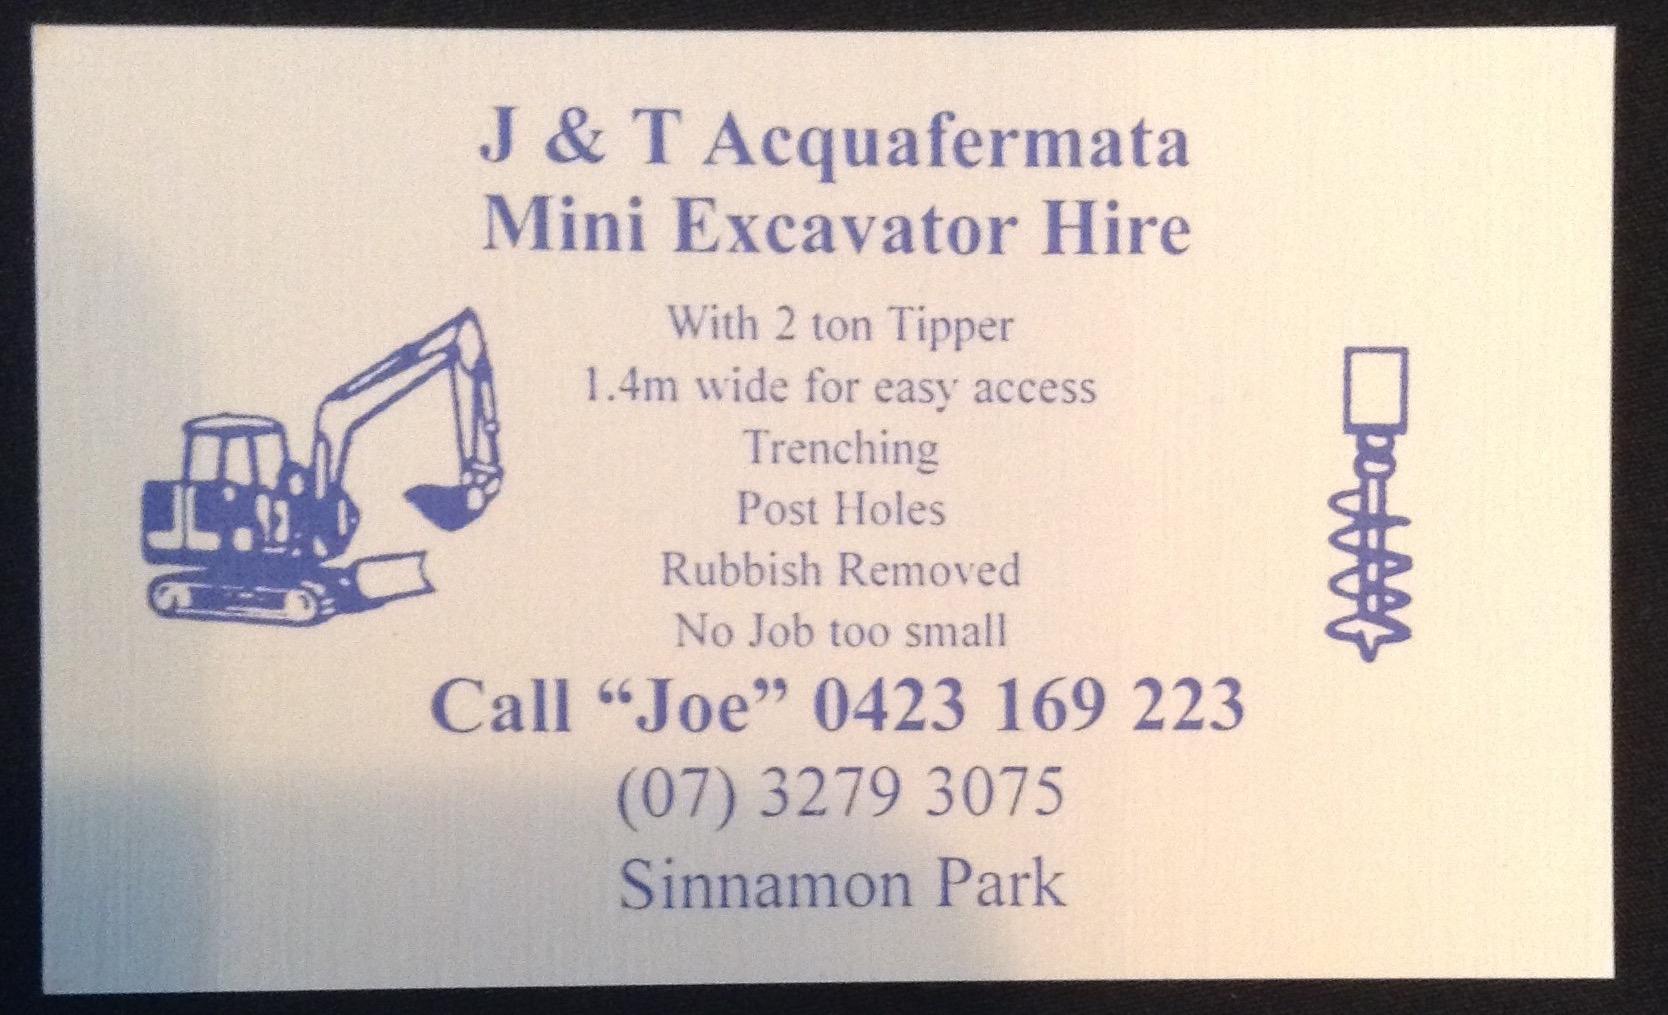 J & T Acquafermata Mini Excavator – 4074 Community and Beyond